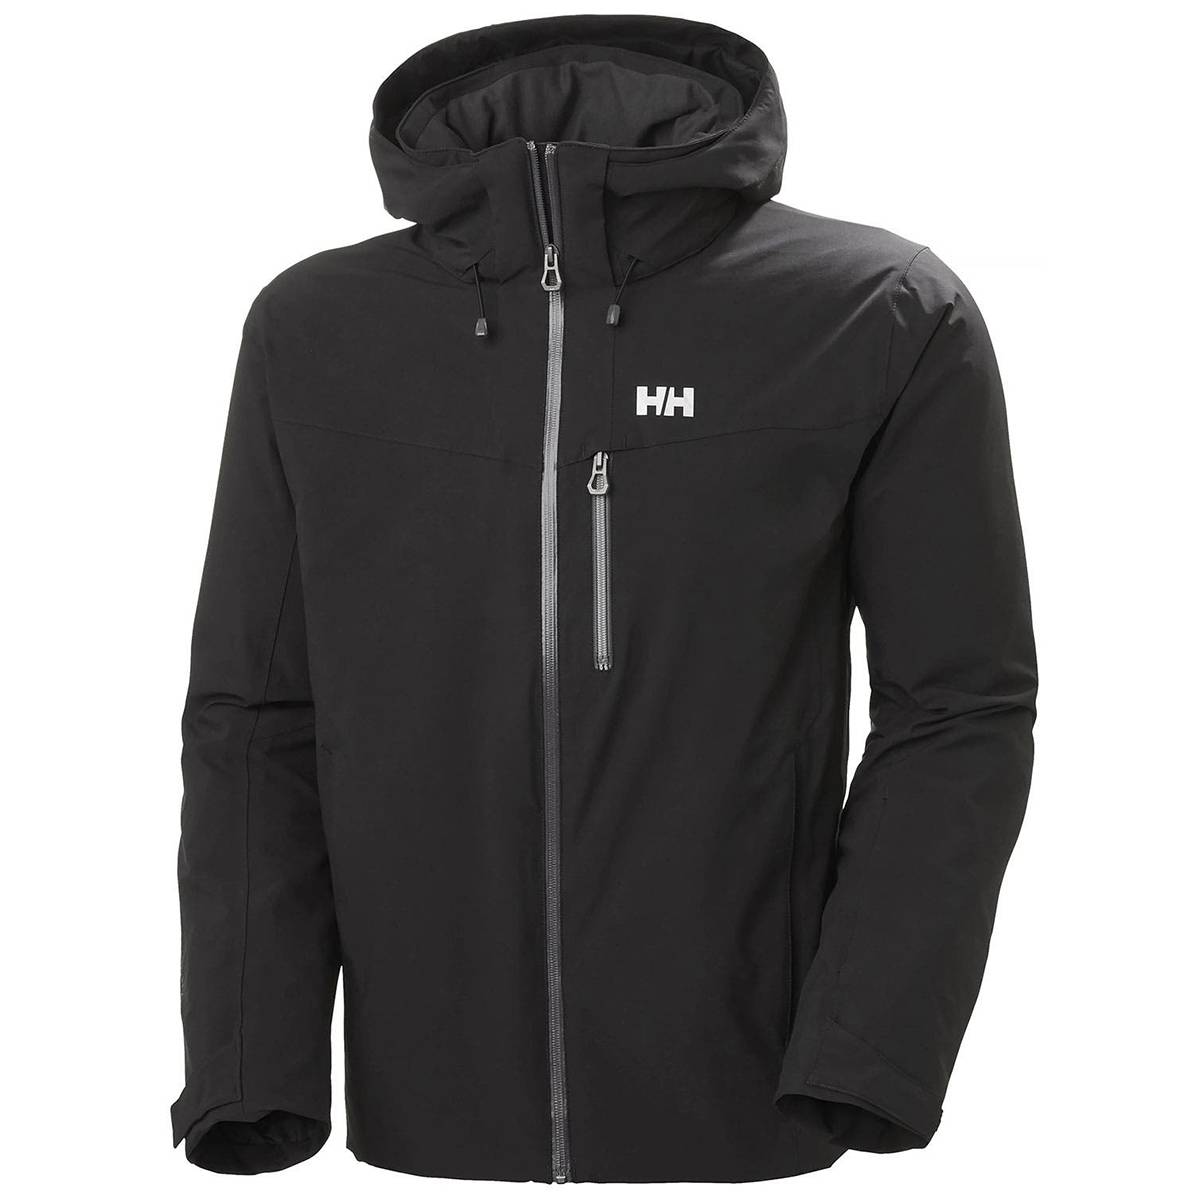 Helly Hansen Men's Swift 4.0 Jacket